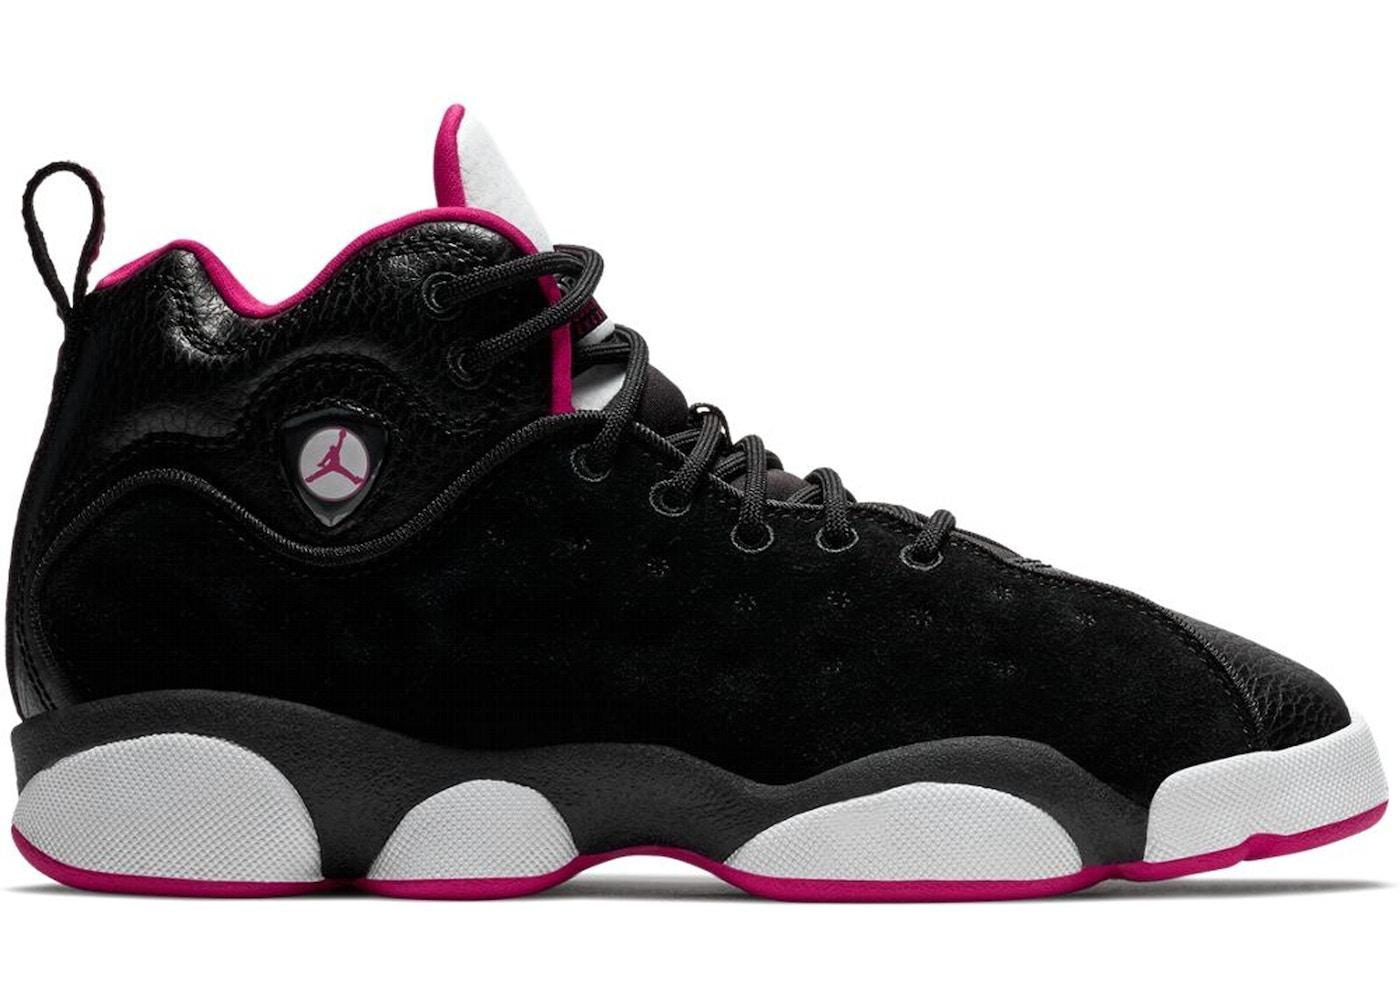 7bf2a8eca0adcd Jordan Jumpman Team 2 Black Rush Pink (GS) - 820276-006